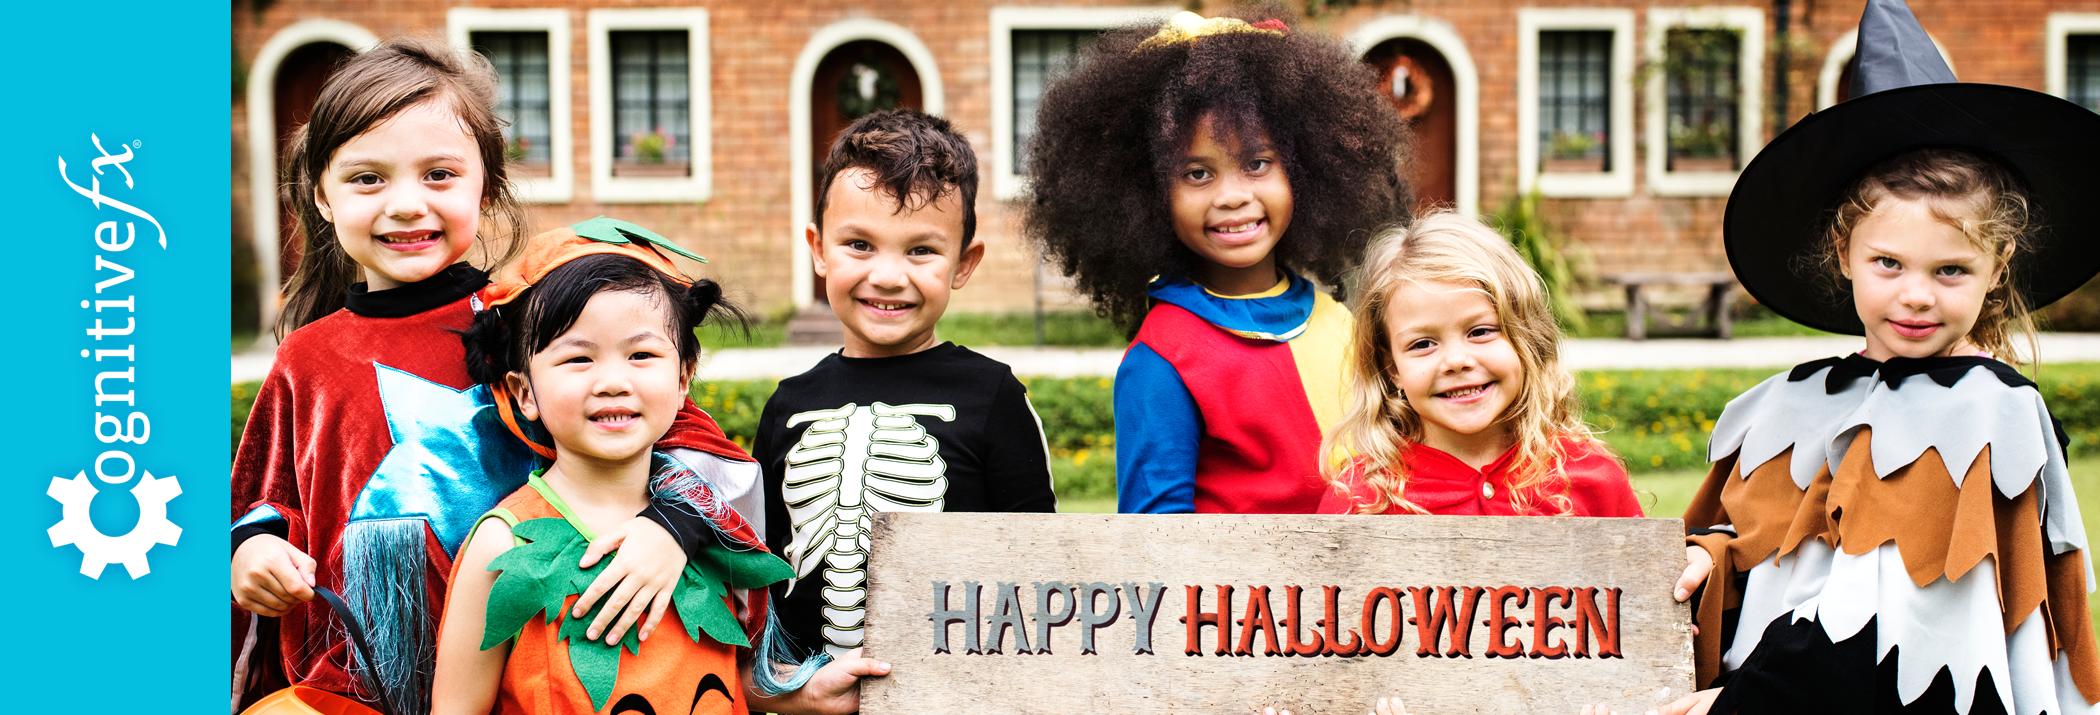 4 Ways to Have an Injury Free Halloween